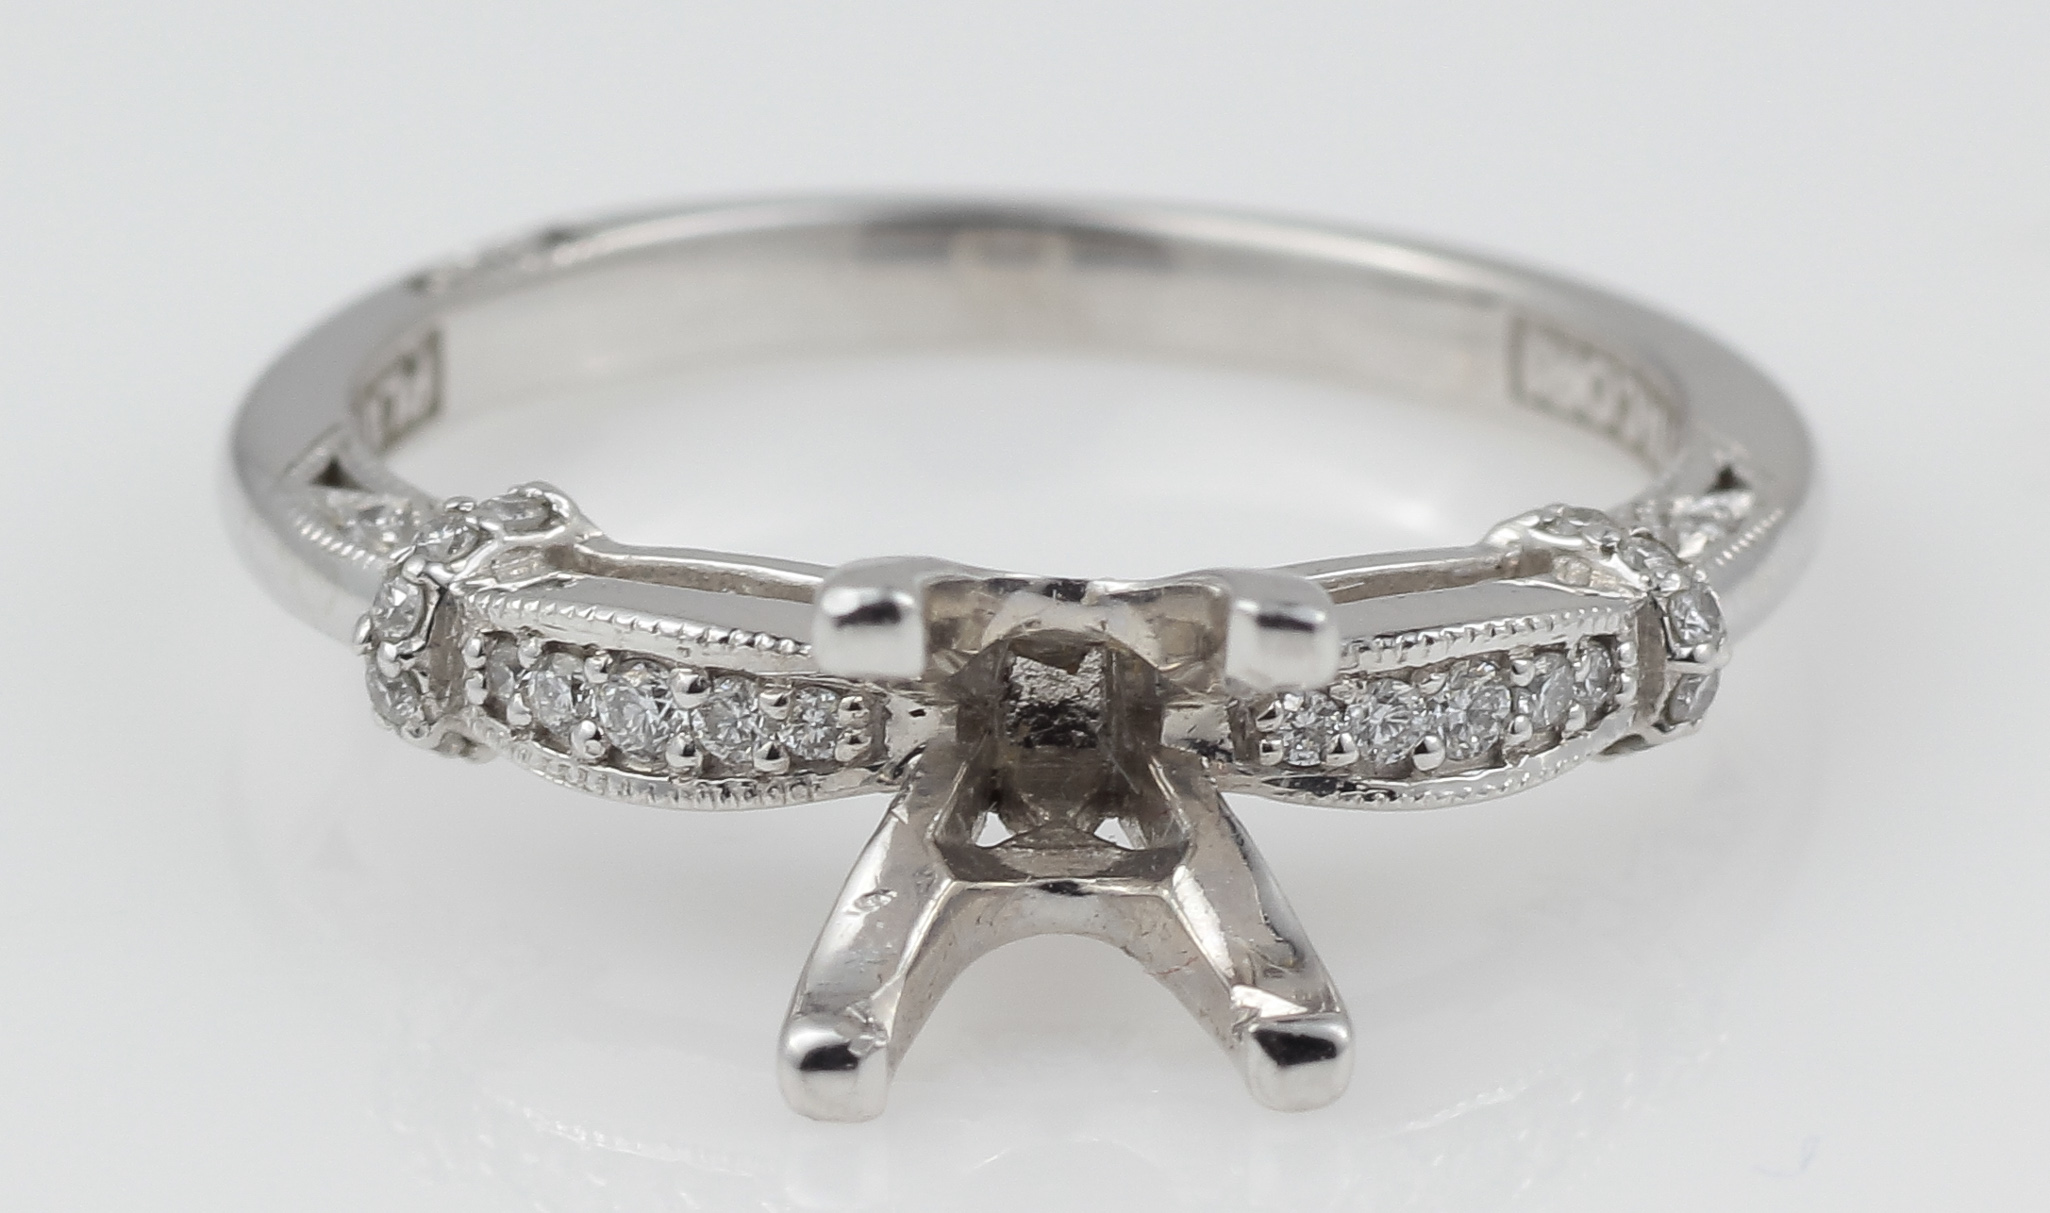 d0b5521af6739 Details about Platinum Tacori Ring Diamond Semi-Mount Raised Gallery Simply  Tacori